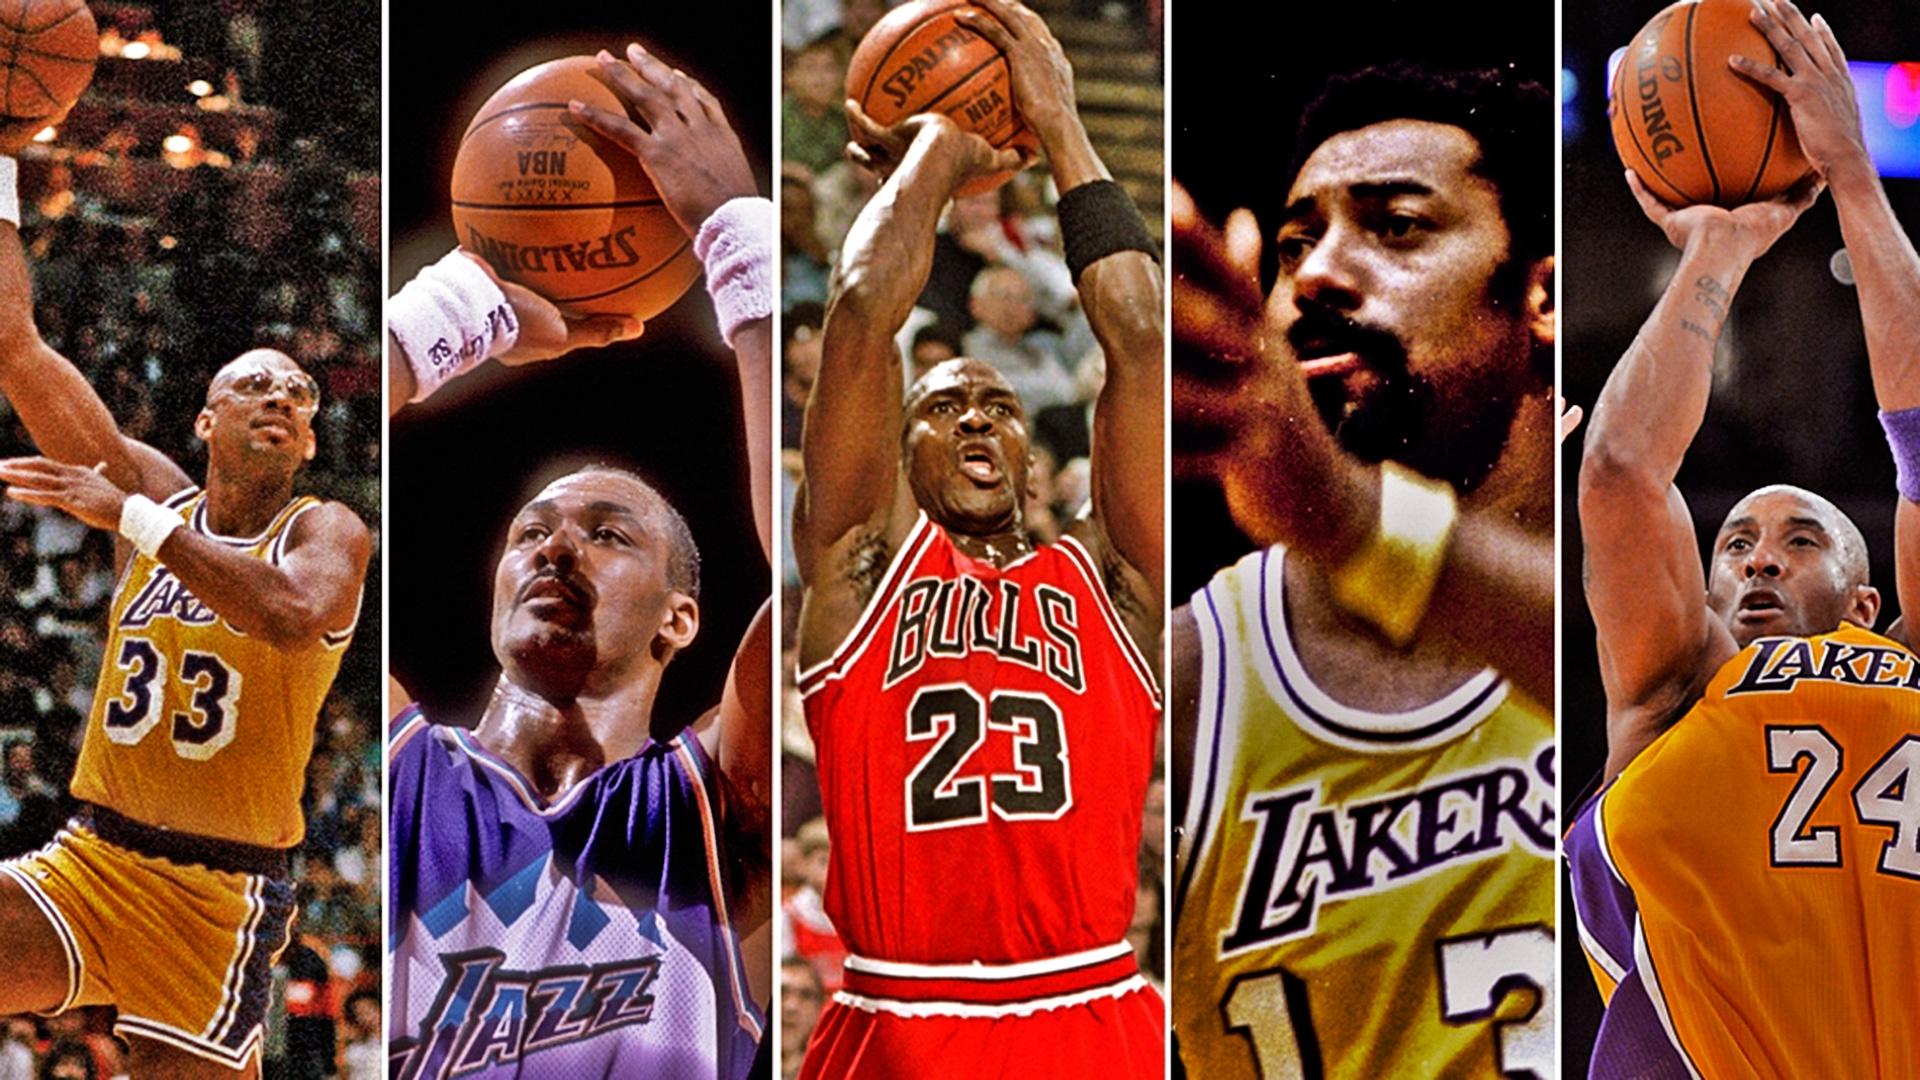 Game 4 Nba Finals 2015 Lebron Stats | All Basketball Scores Info